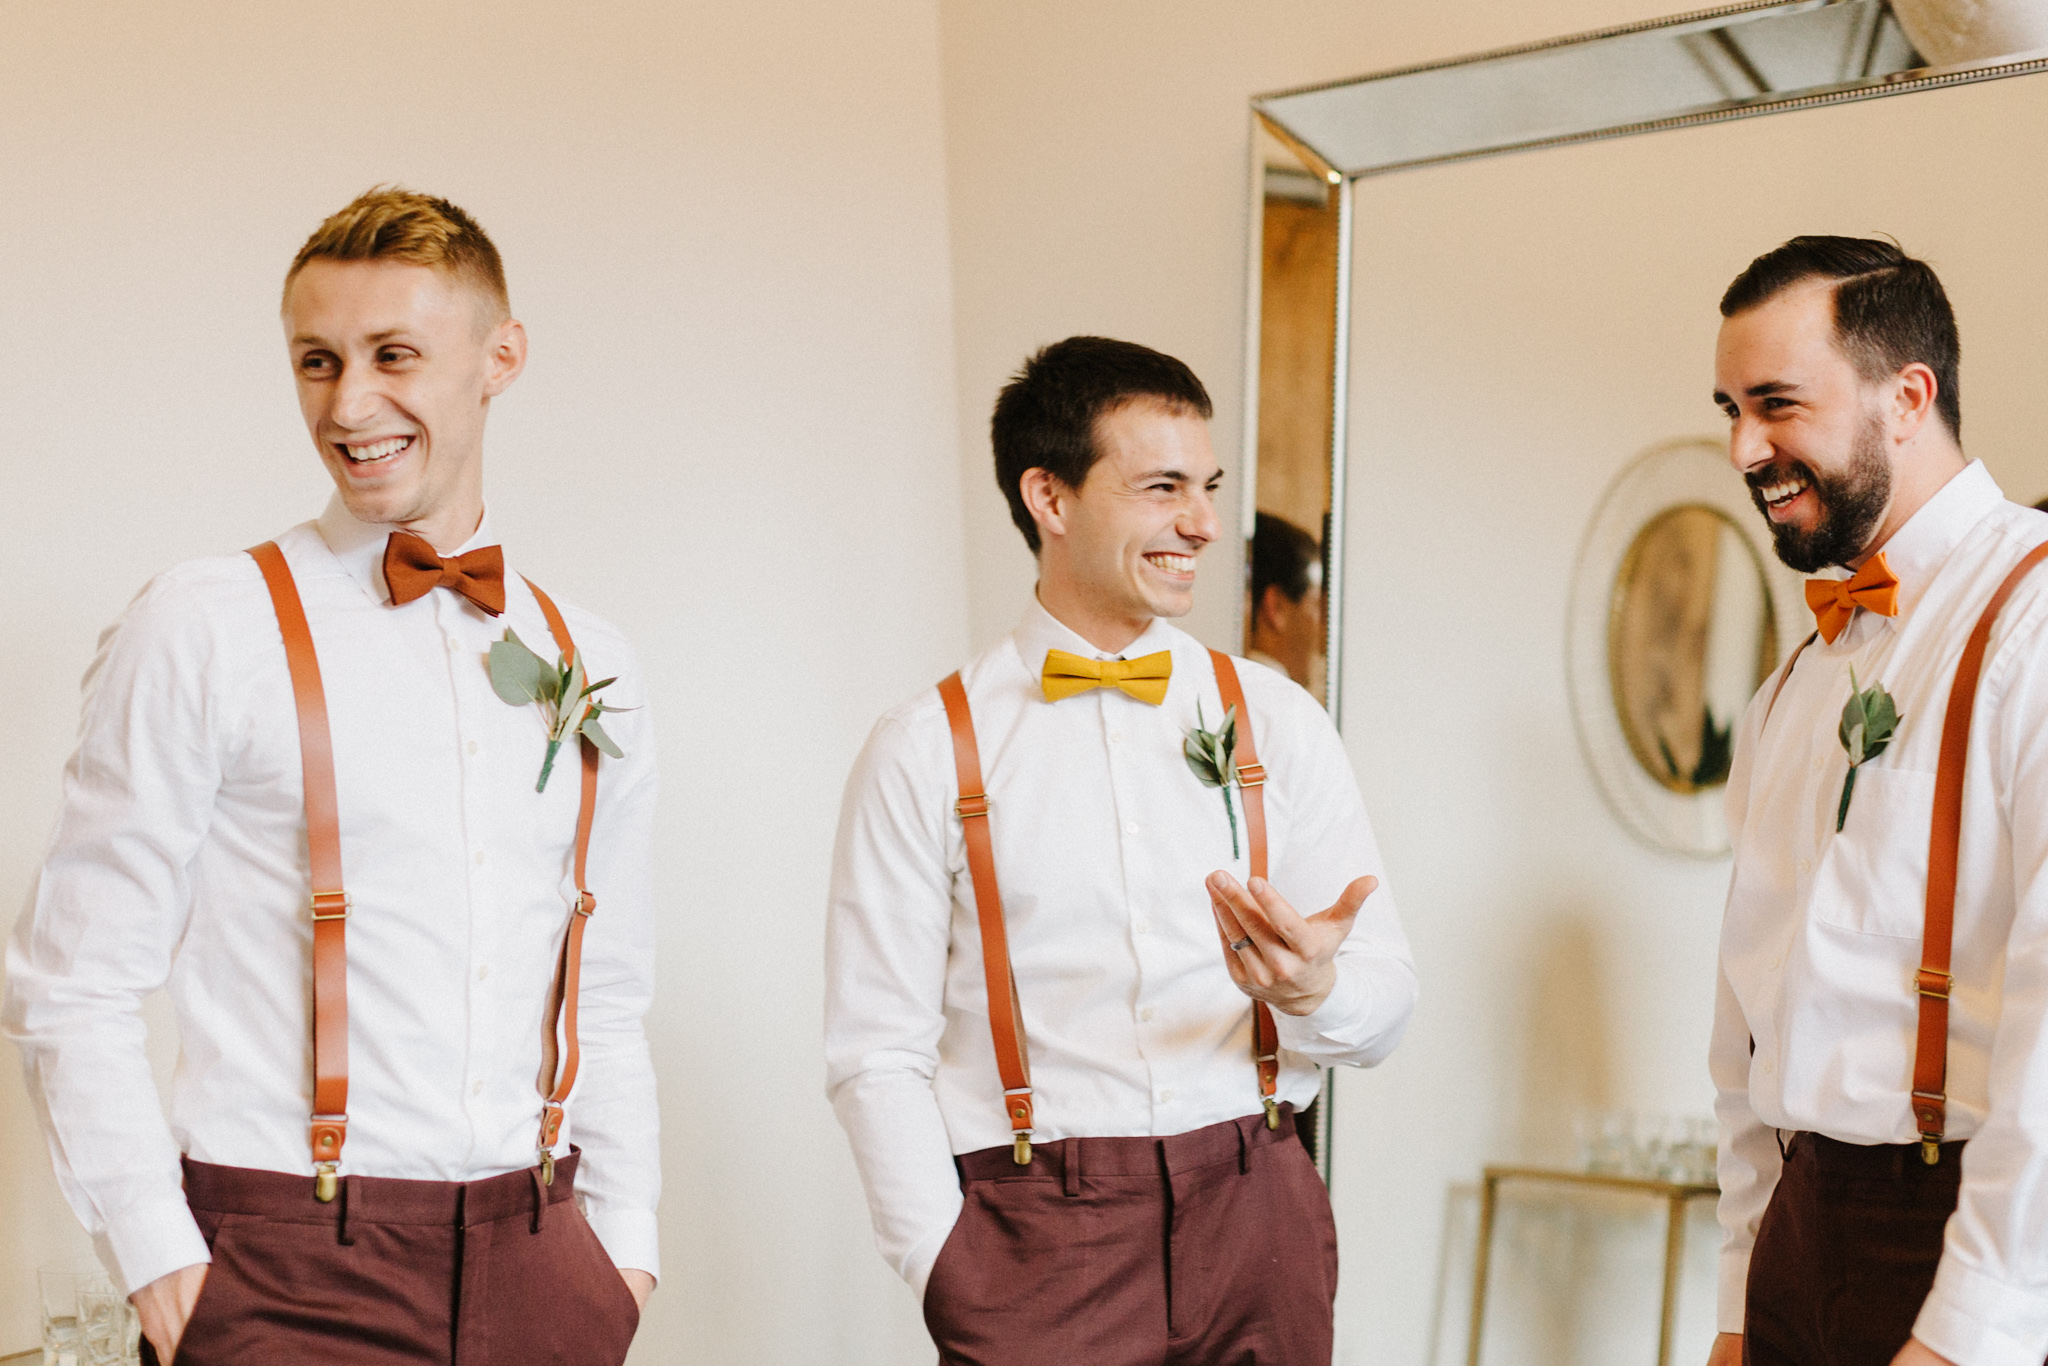 12_19-03-30 Caylen and Max Wedding Previews-21.jpg